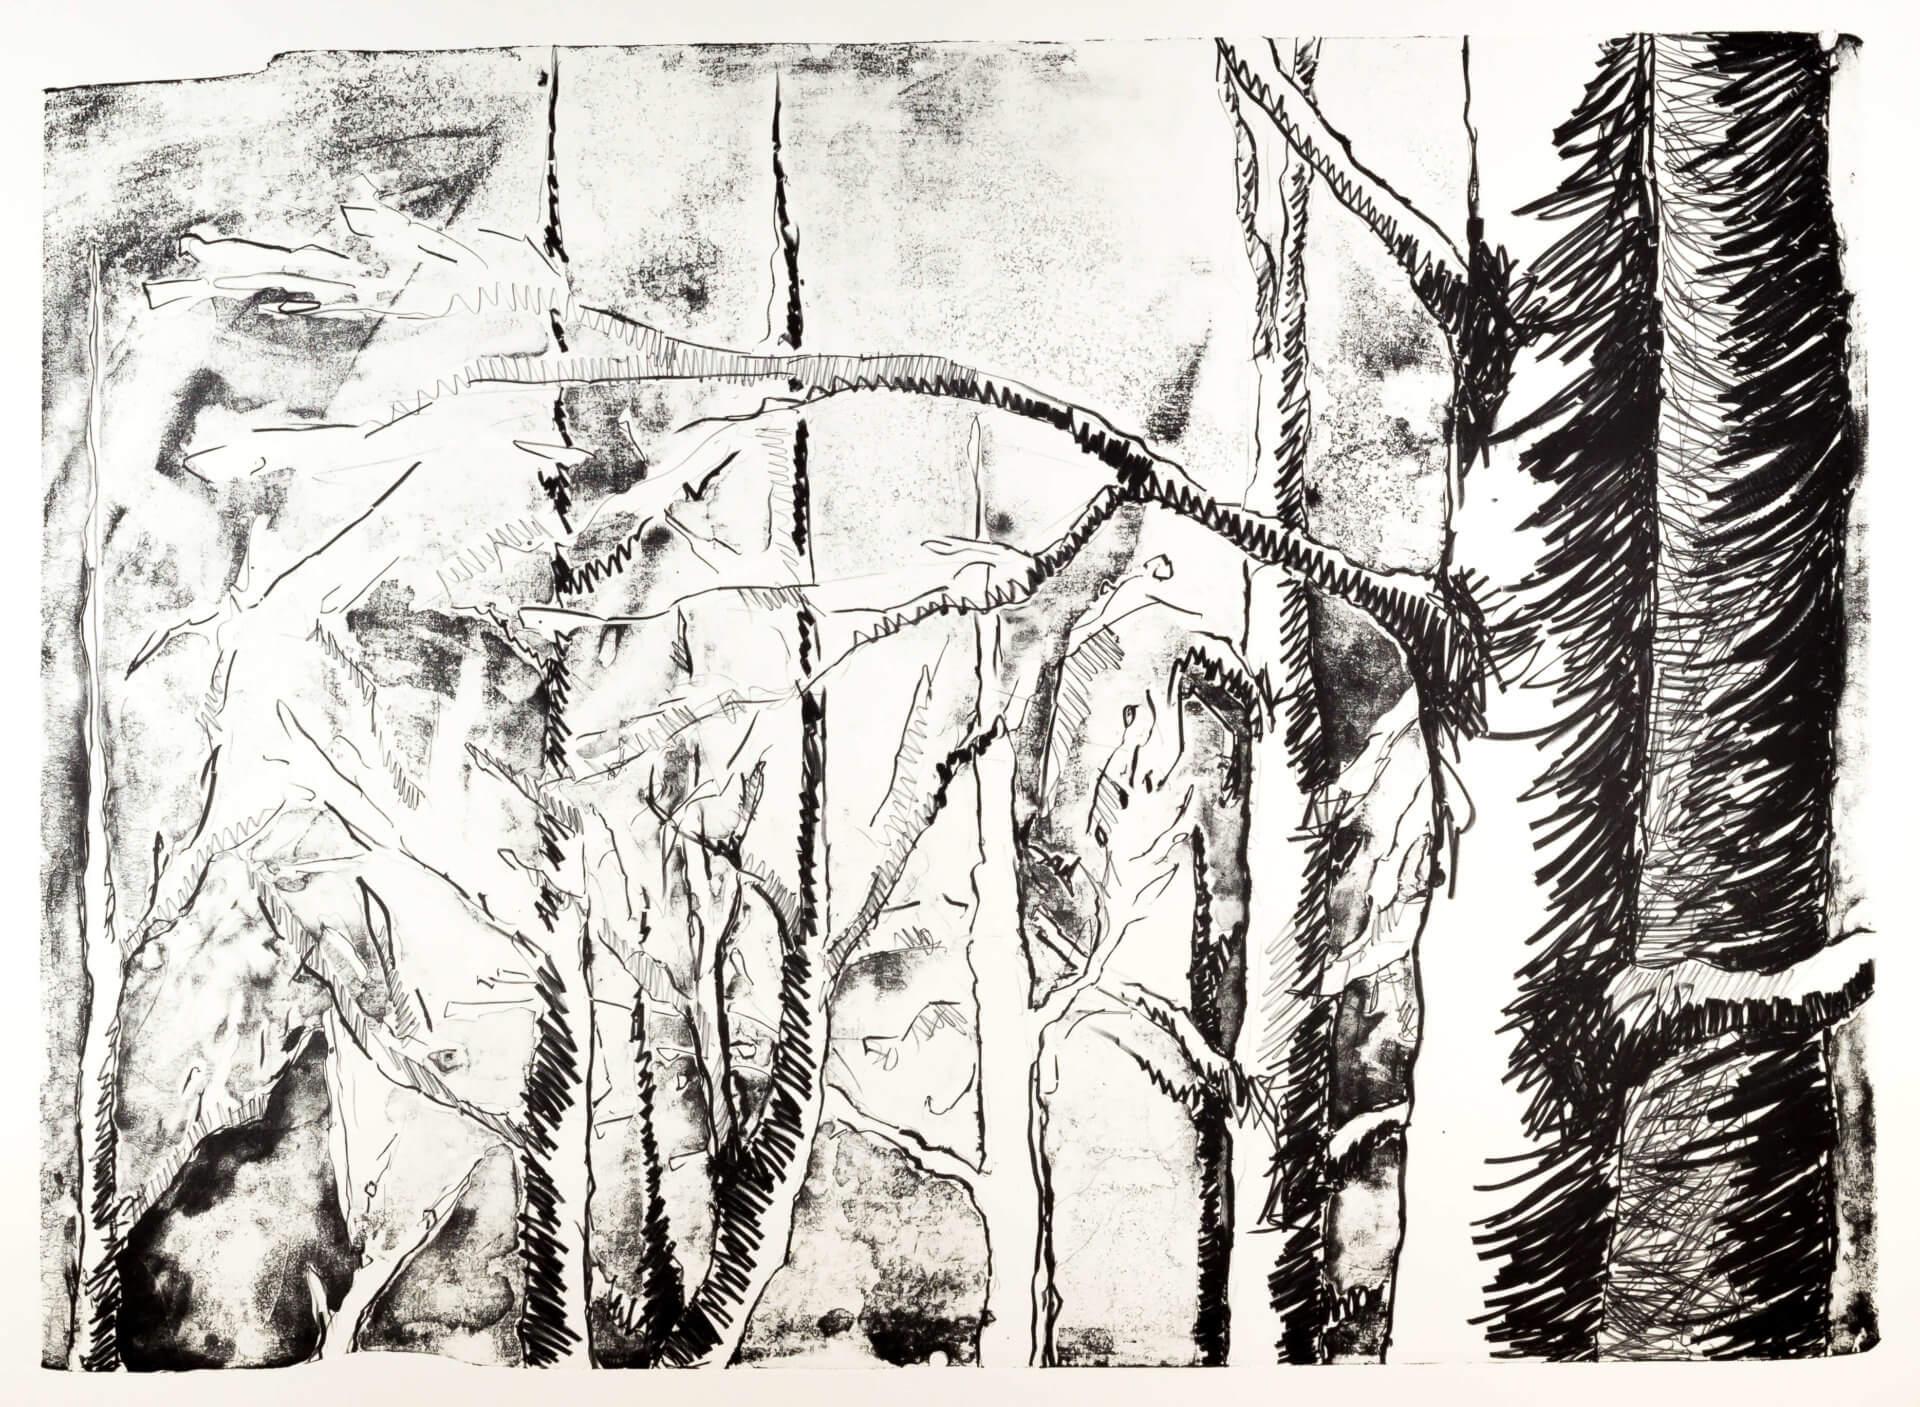 Katharina Albers, Wald (E), 2015, Lithographie (8 Steine), Unikat, 70×100 cm